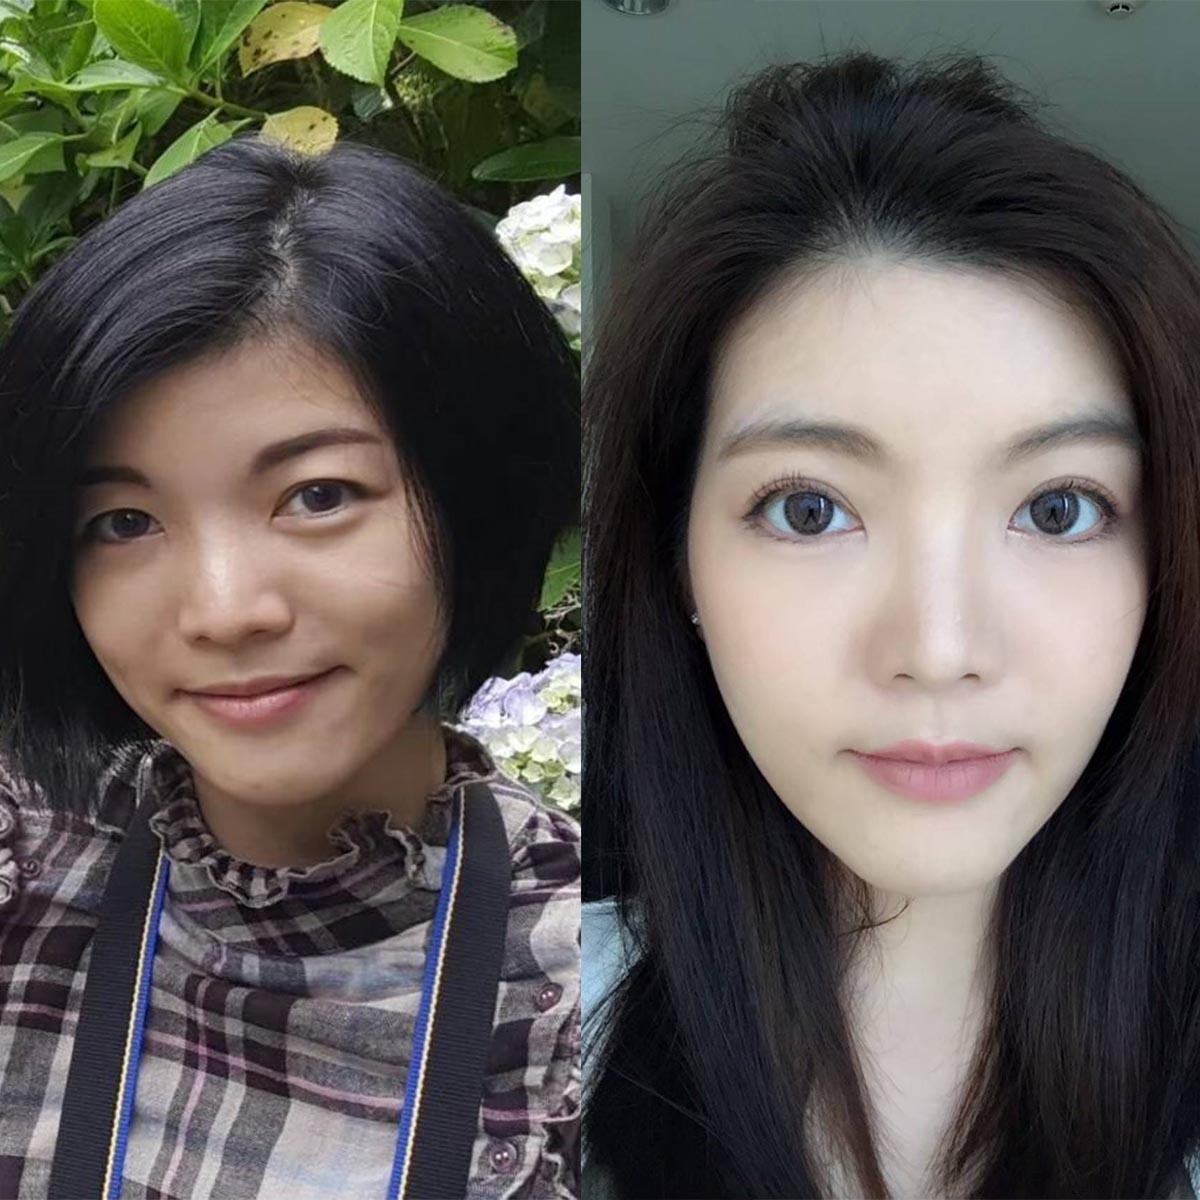 Before-After ทำตาสองชั้น เทคนิค Big eye surgery